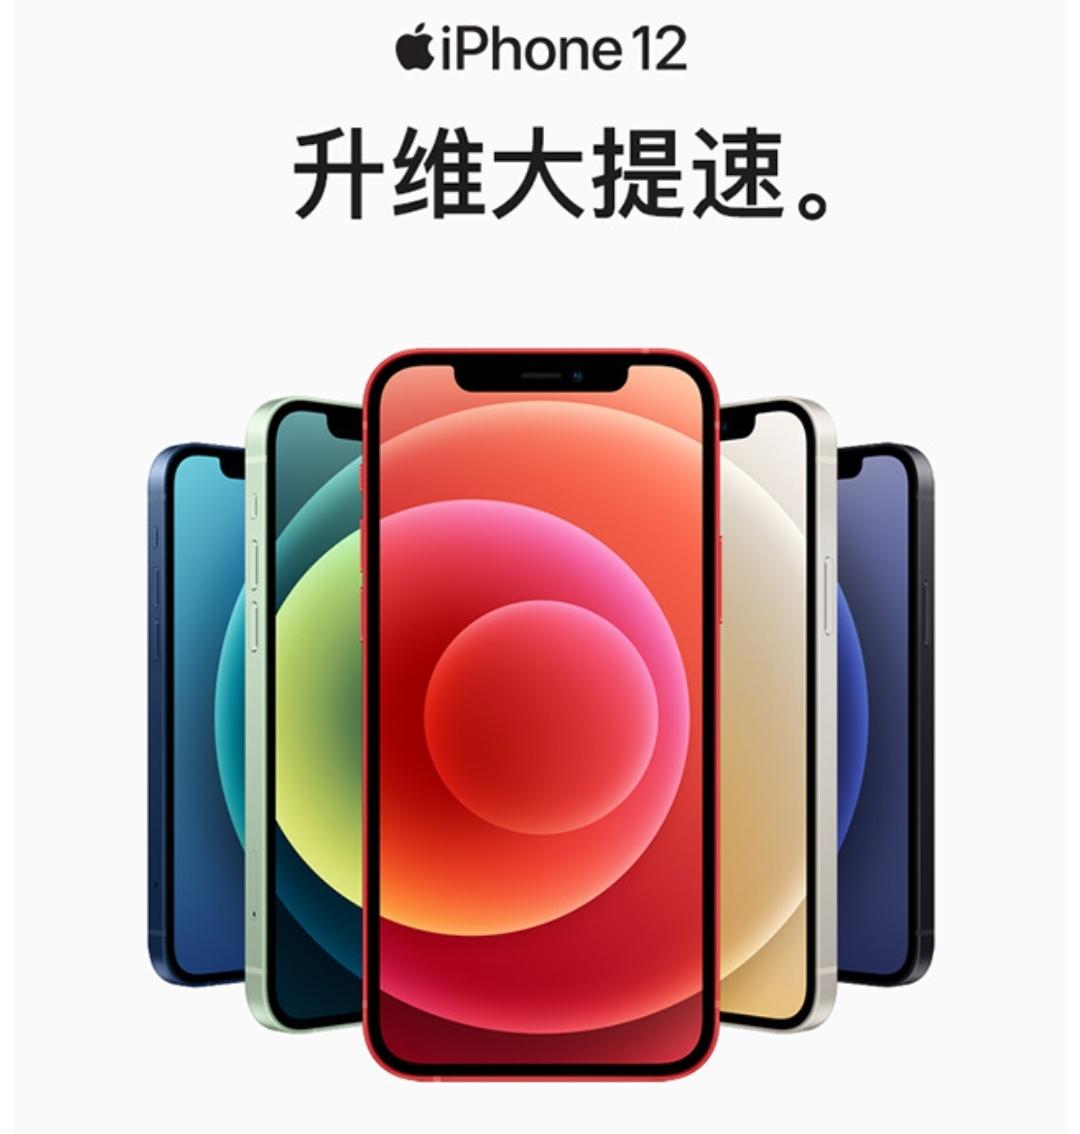 5G时代直屏王者,iPhone12应该是毋庸置疑的 好物评测 第2张